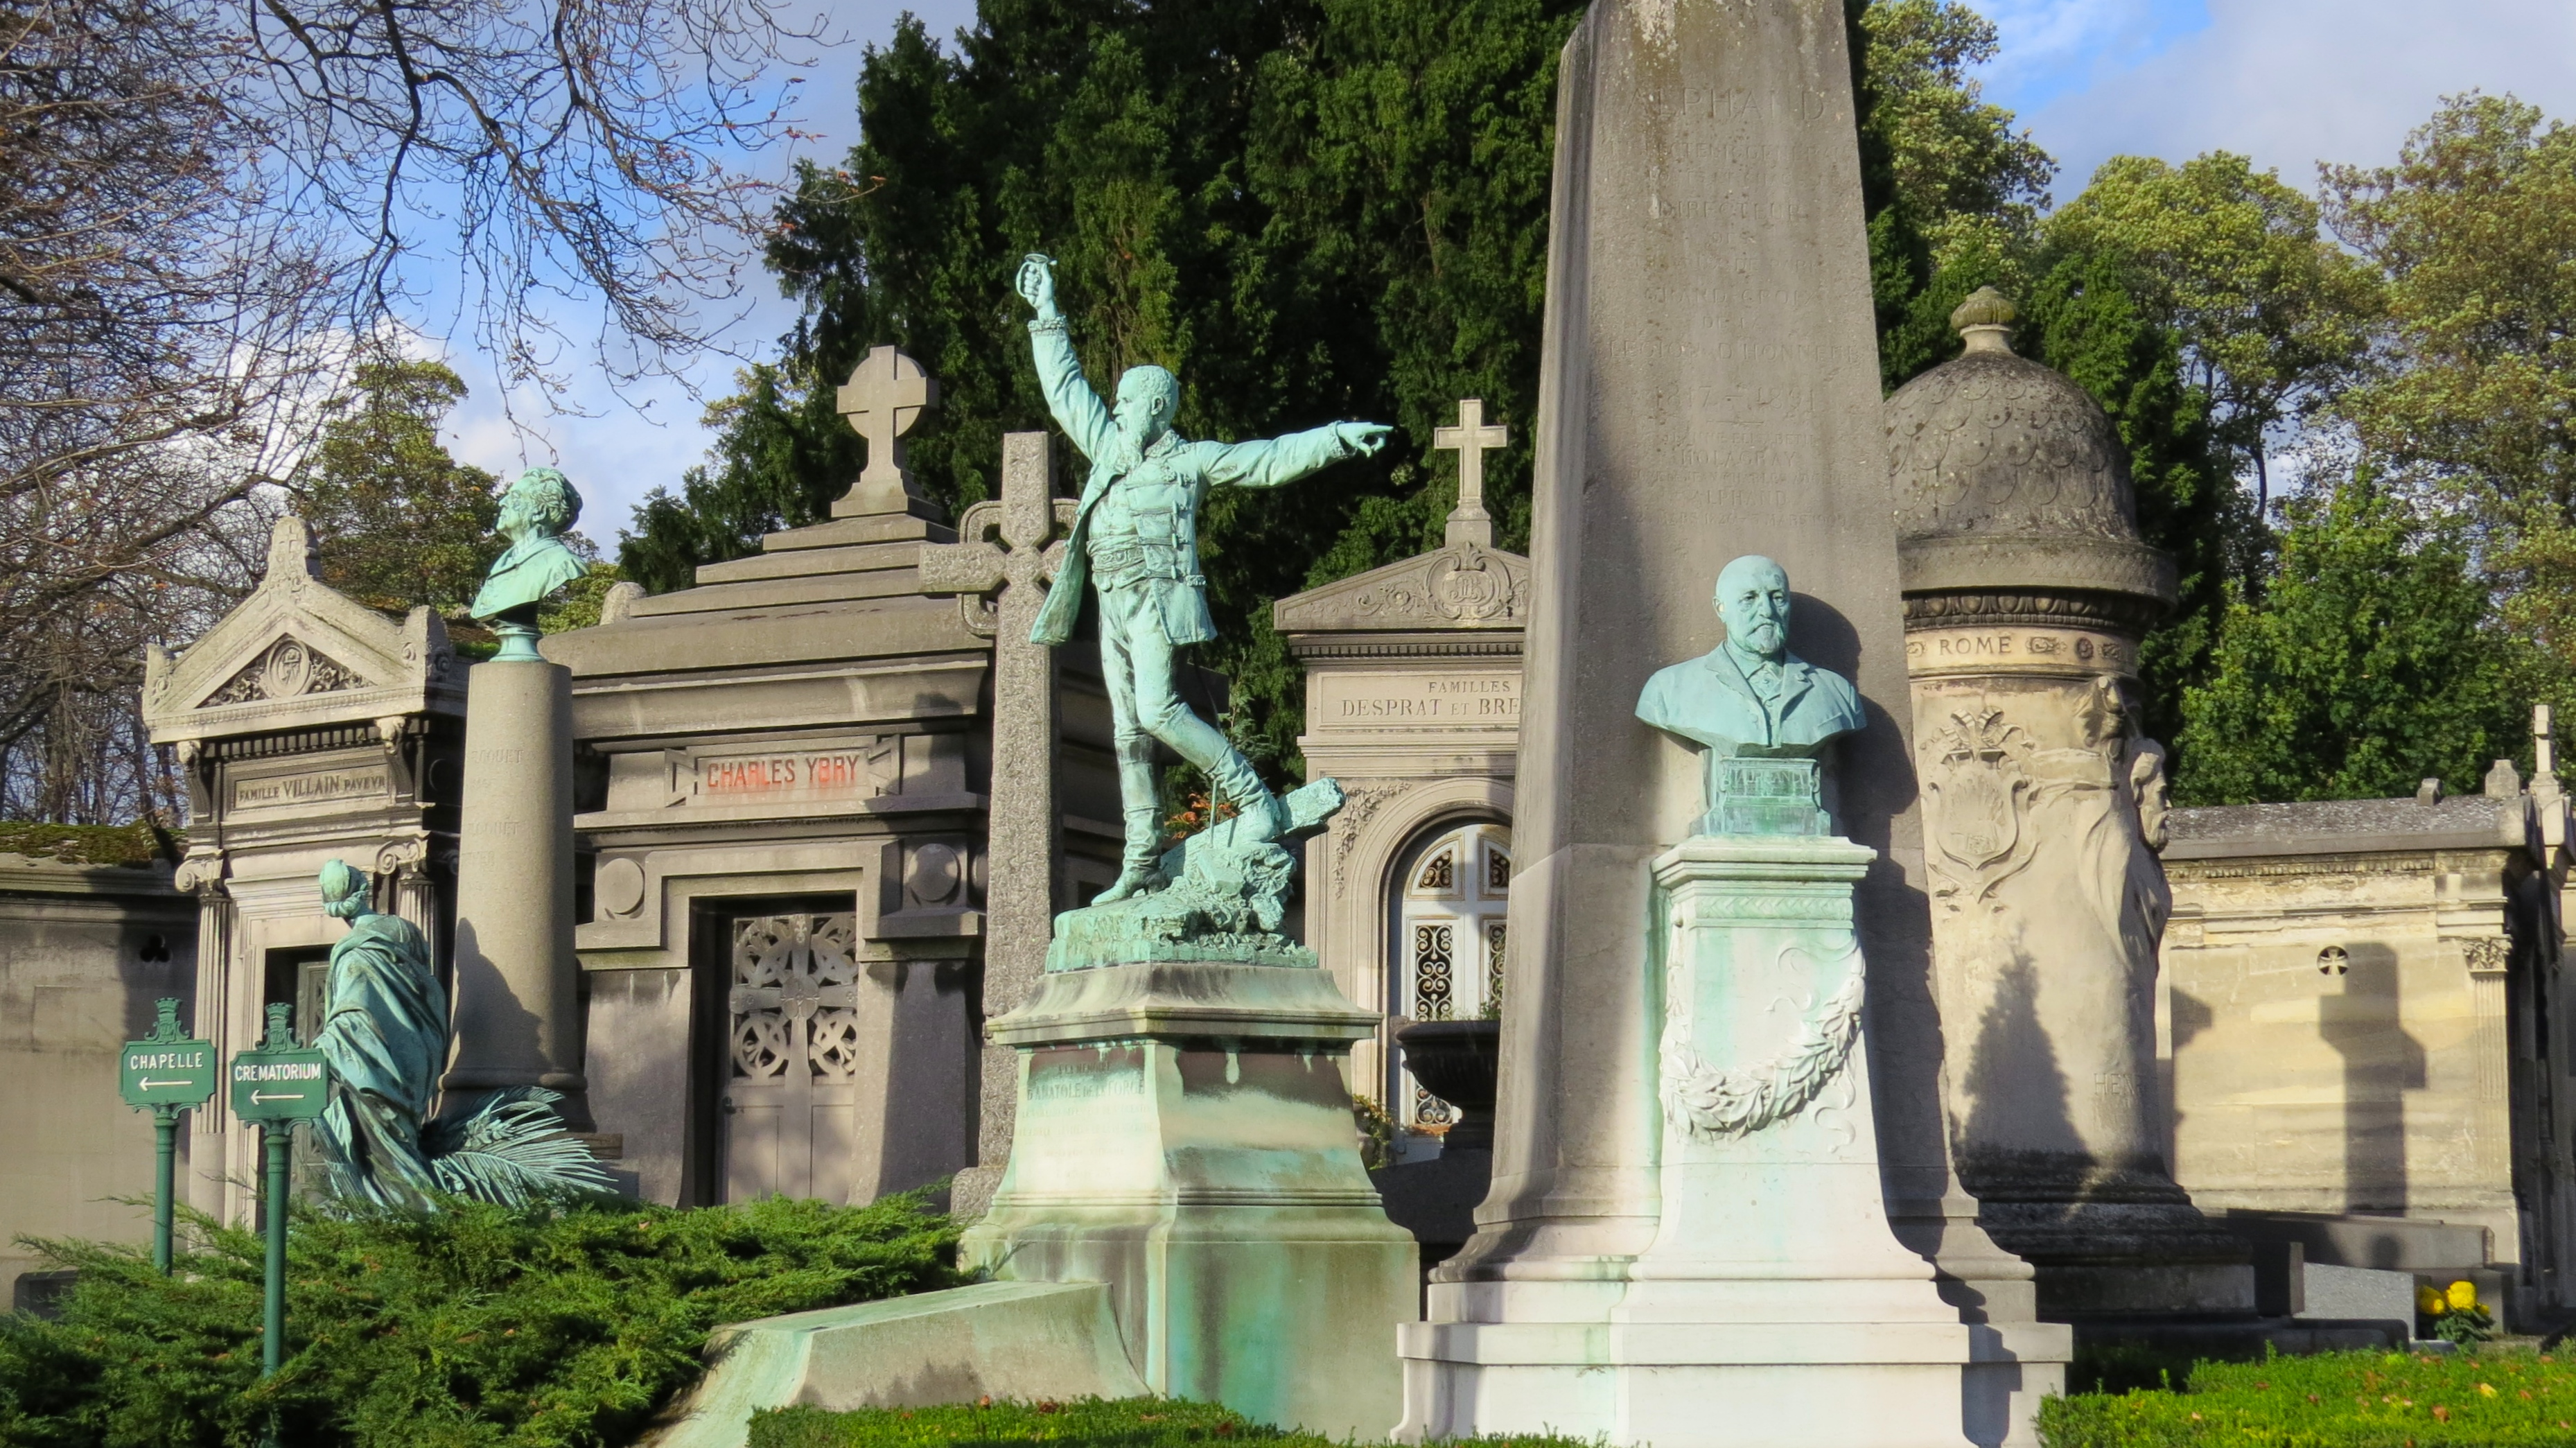 green statues